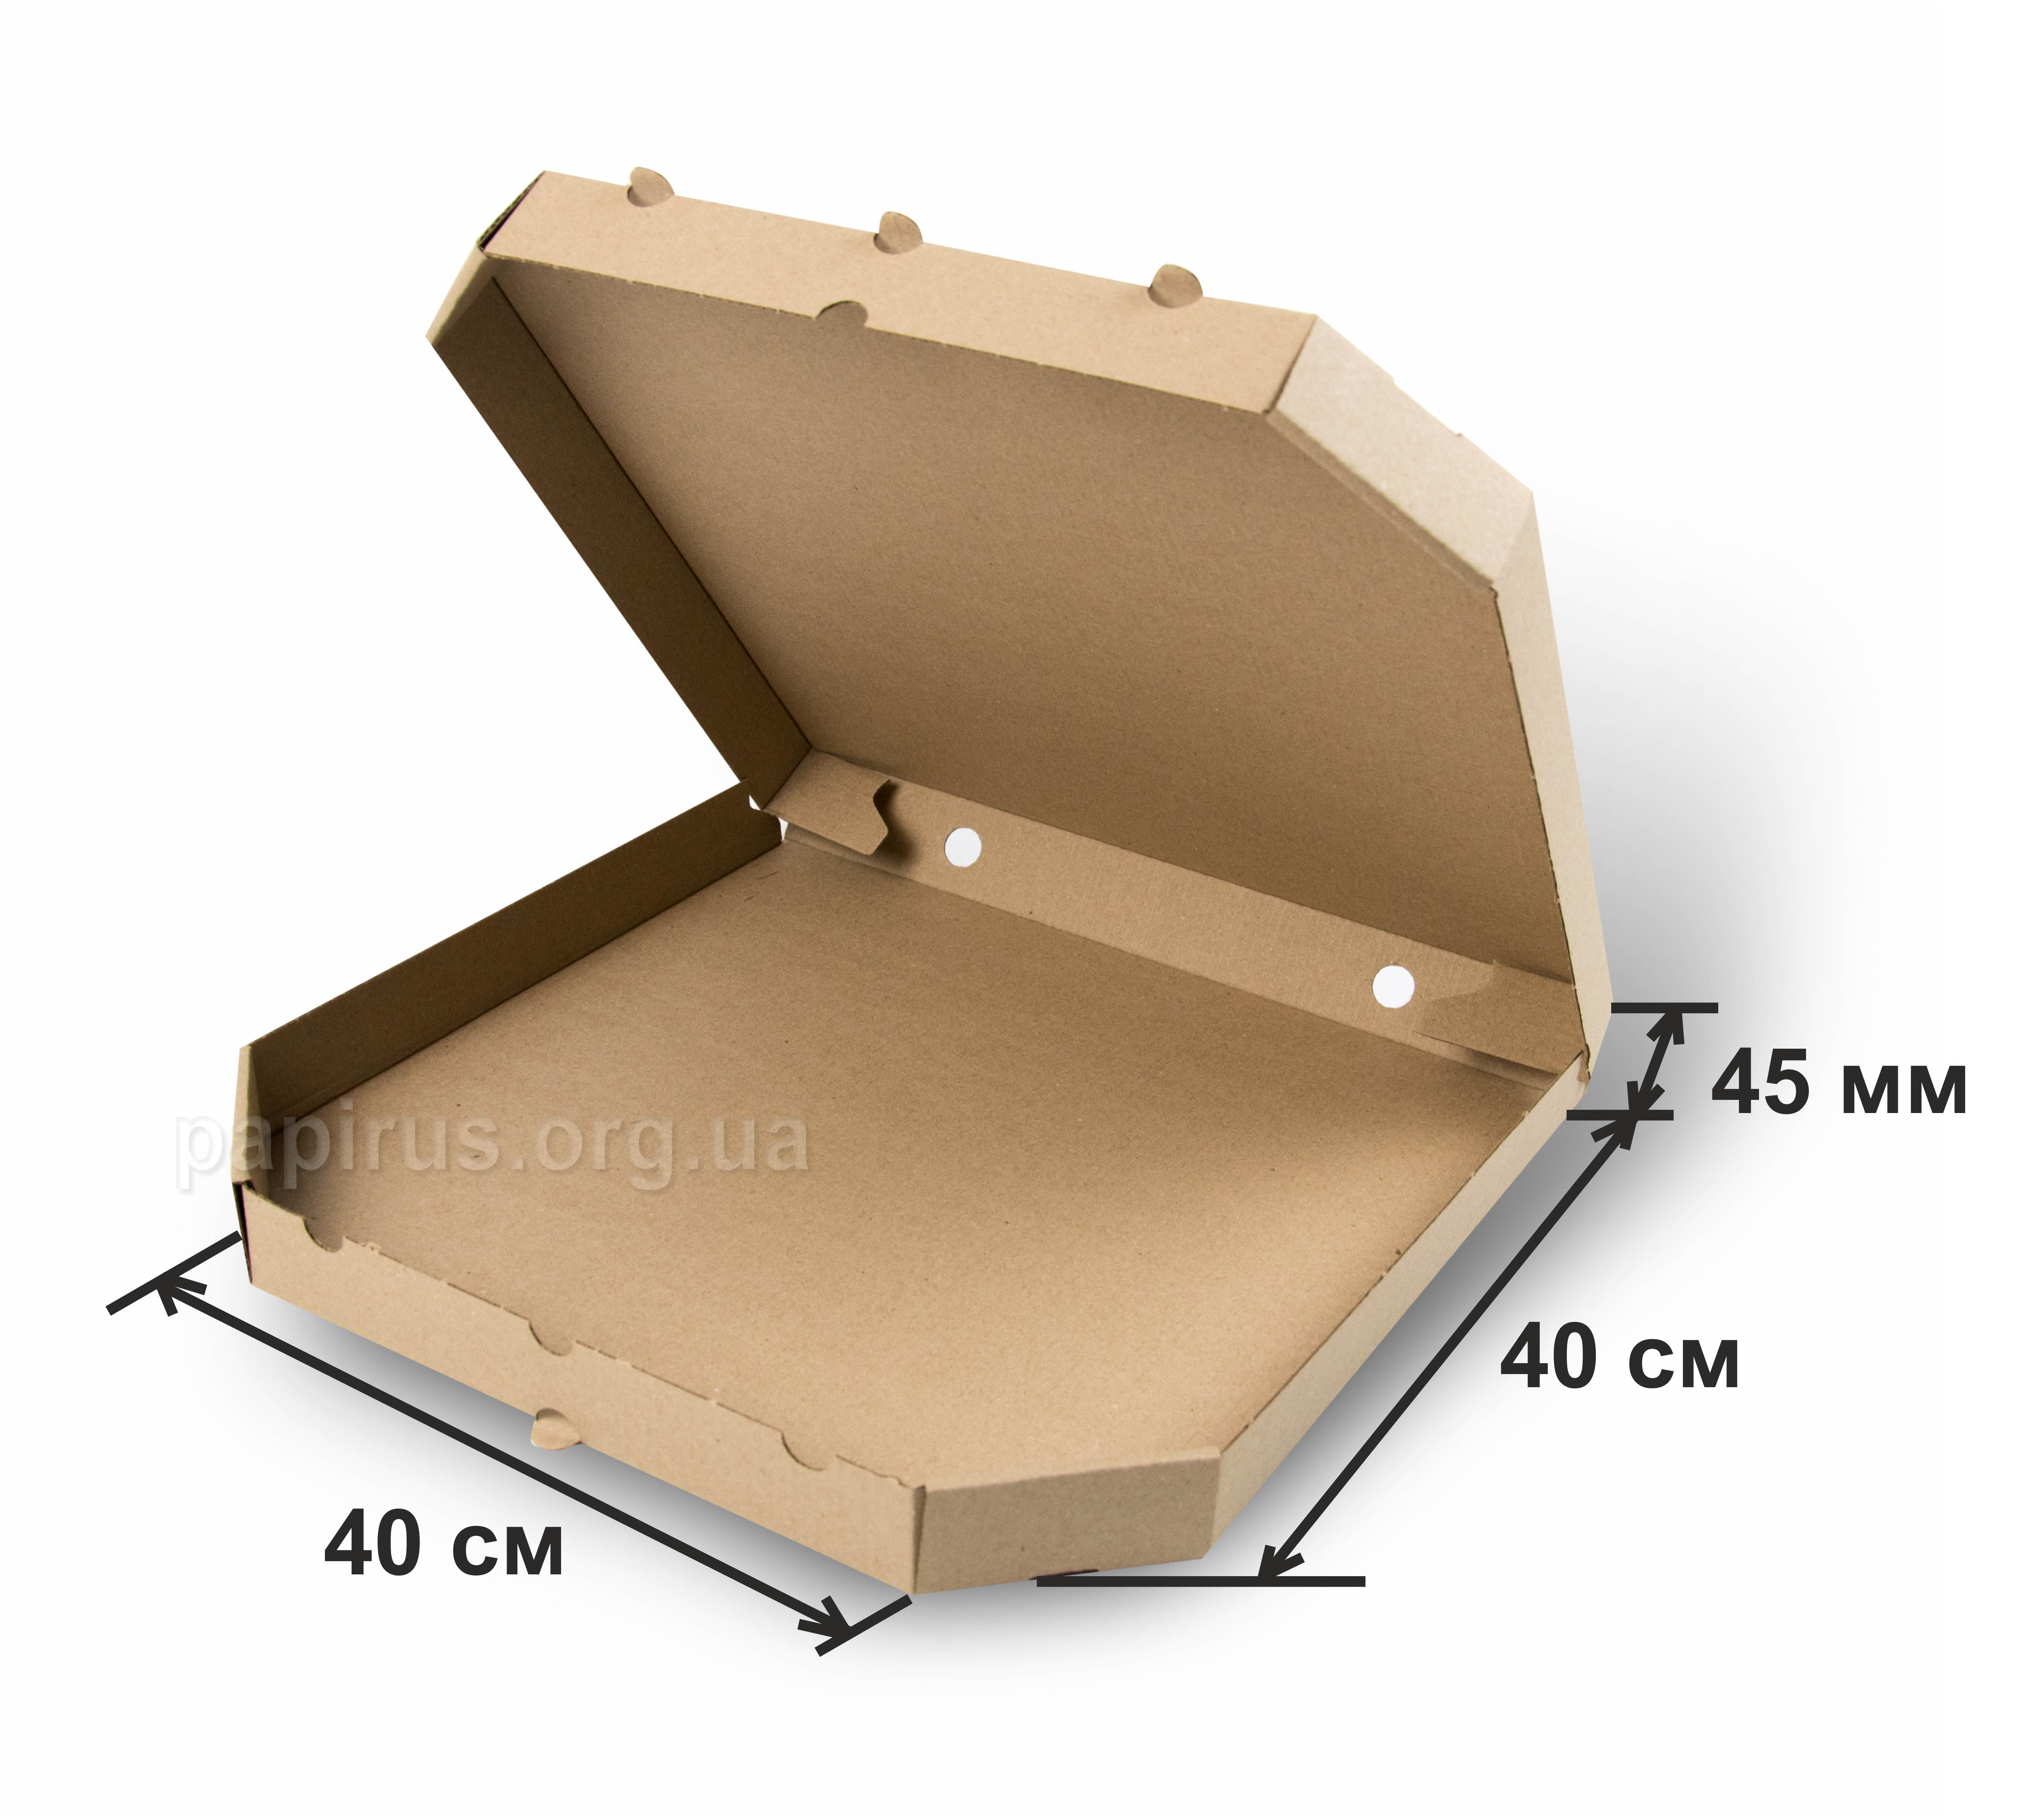 Коробка для пиццы бурая 4000х4000, г.Сумы, Типография Папирус